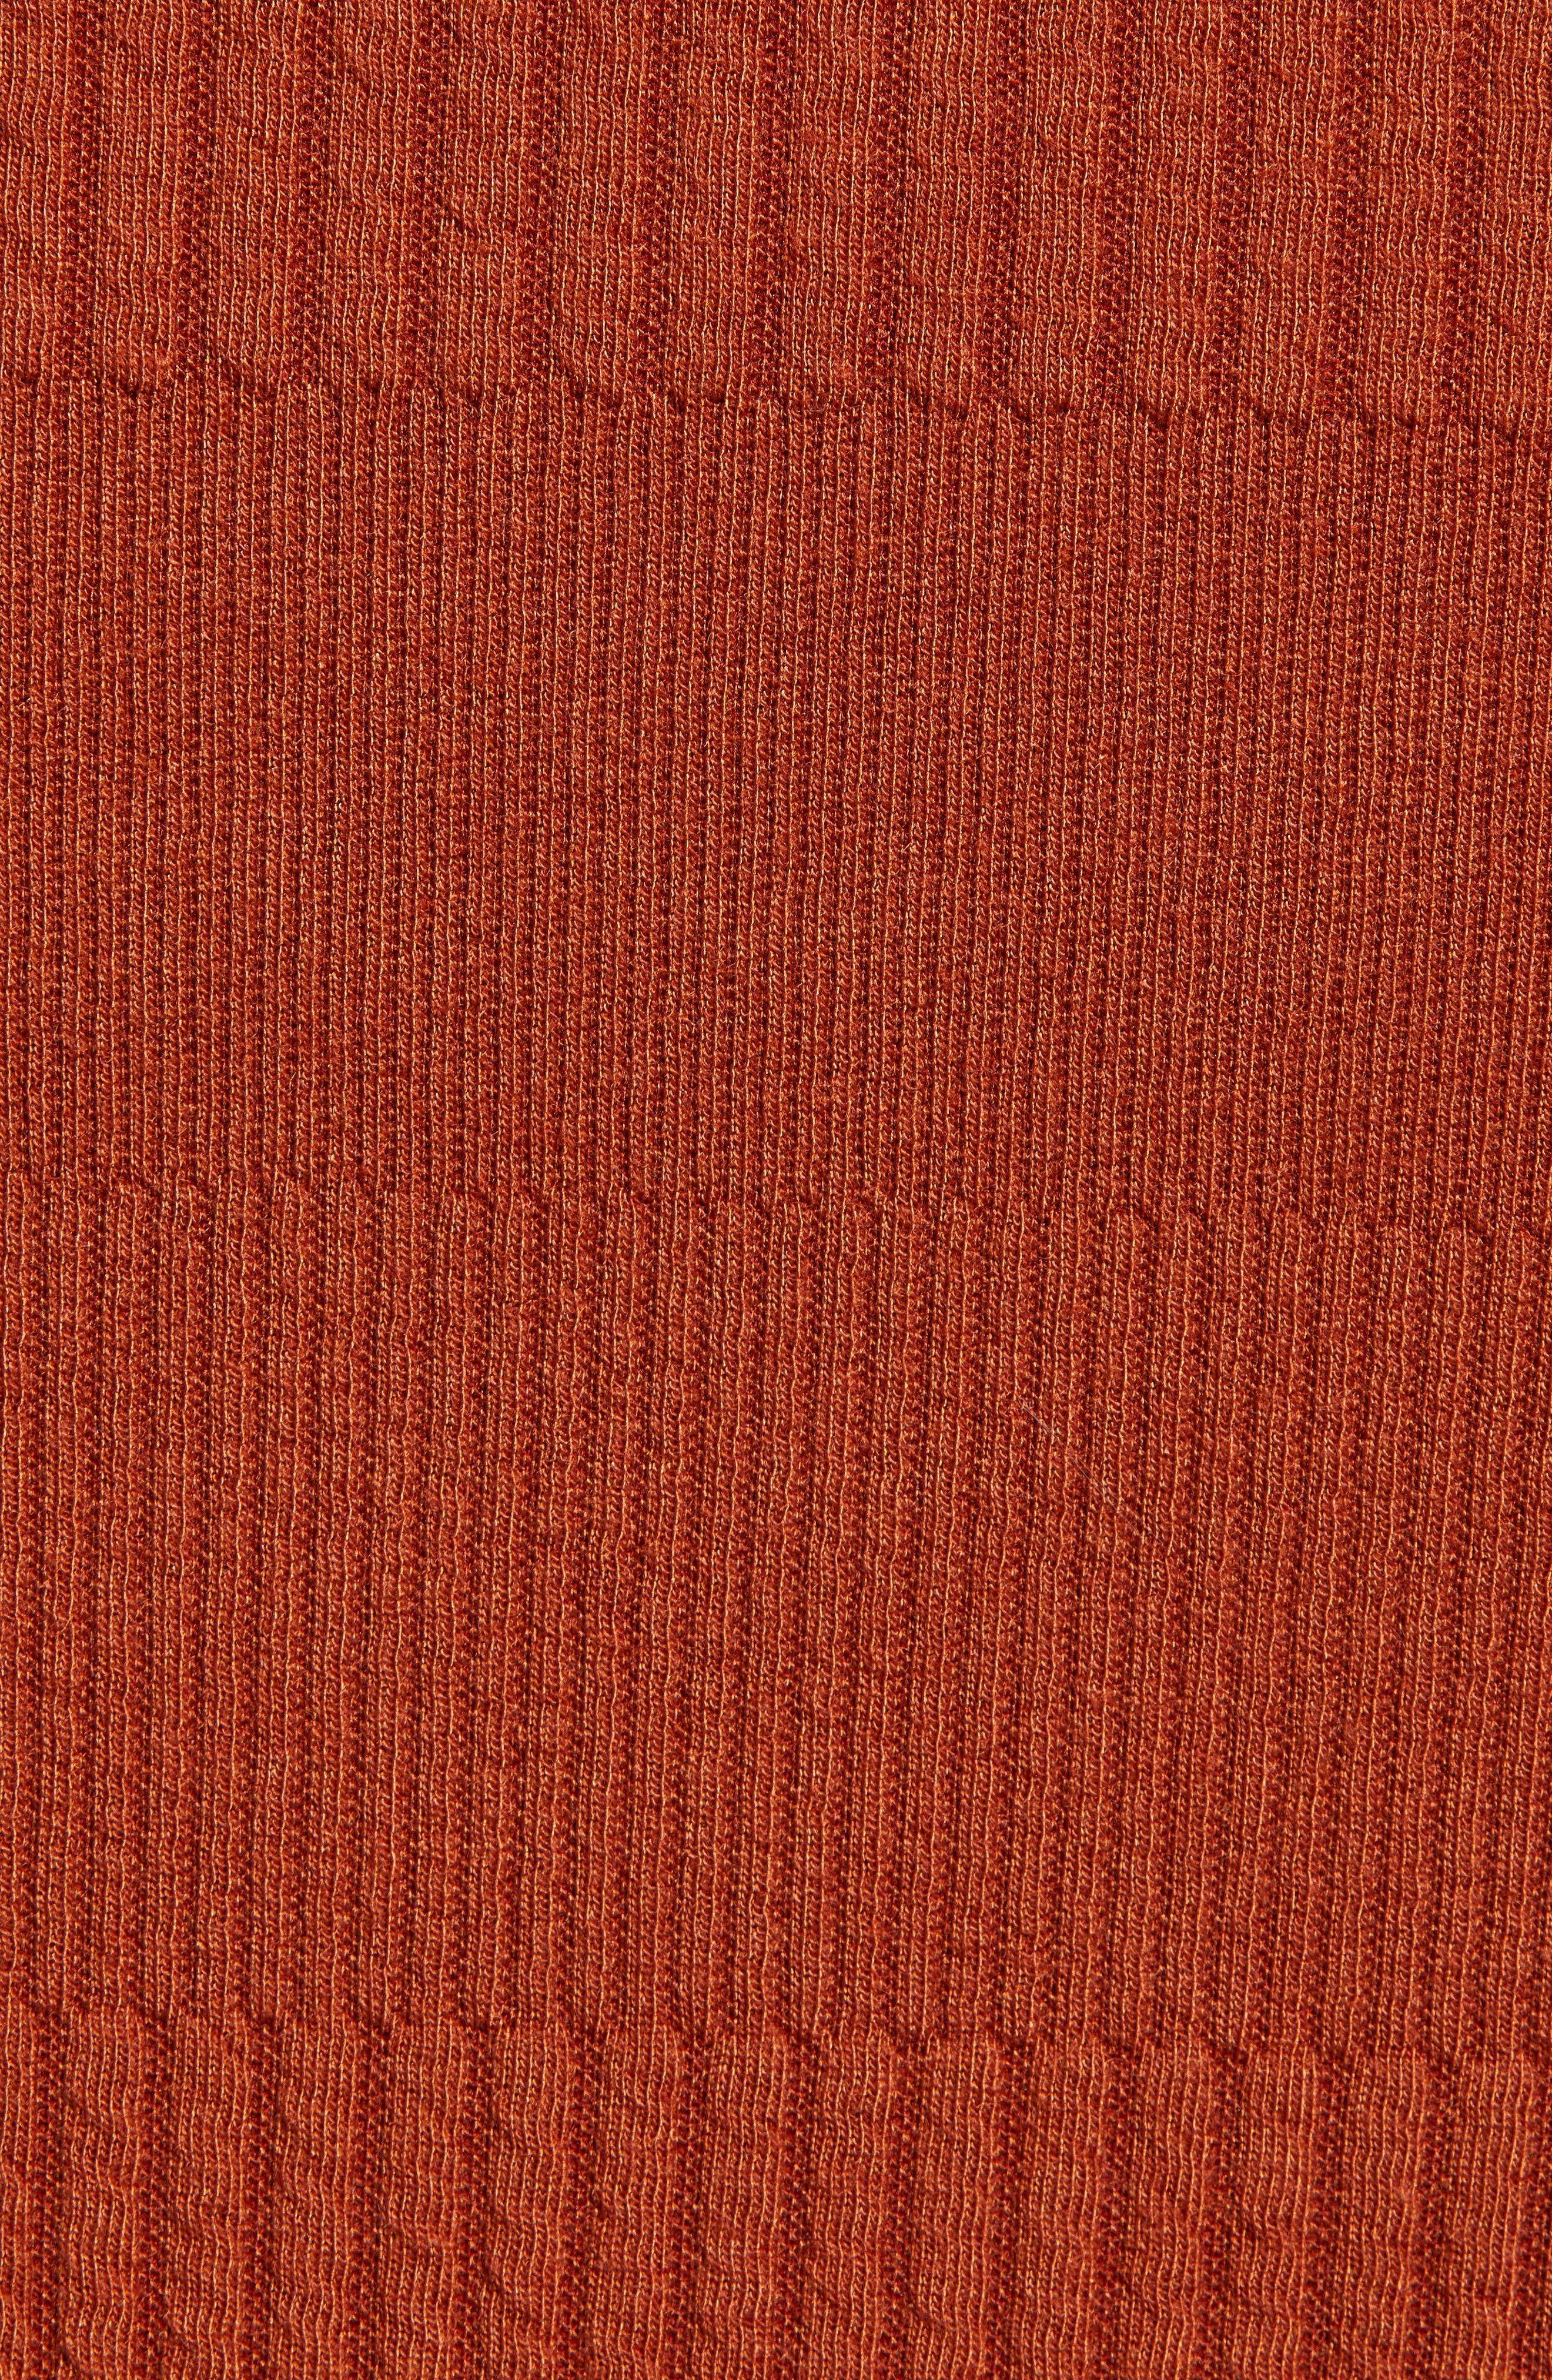 Midi Pencil Skirt,                             Alternate thumbnail 5, color,                             BROWN SPICE